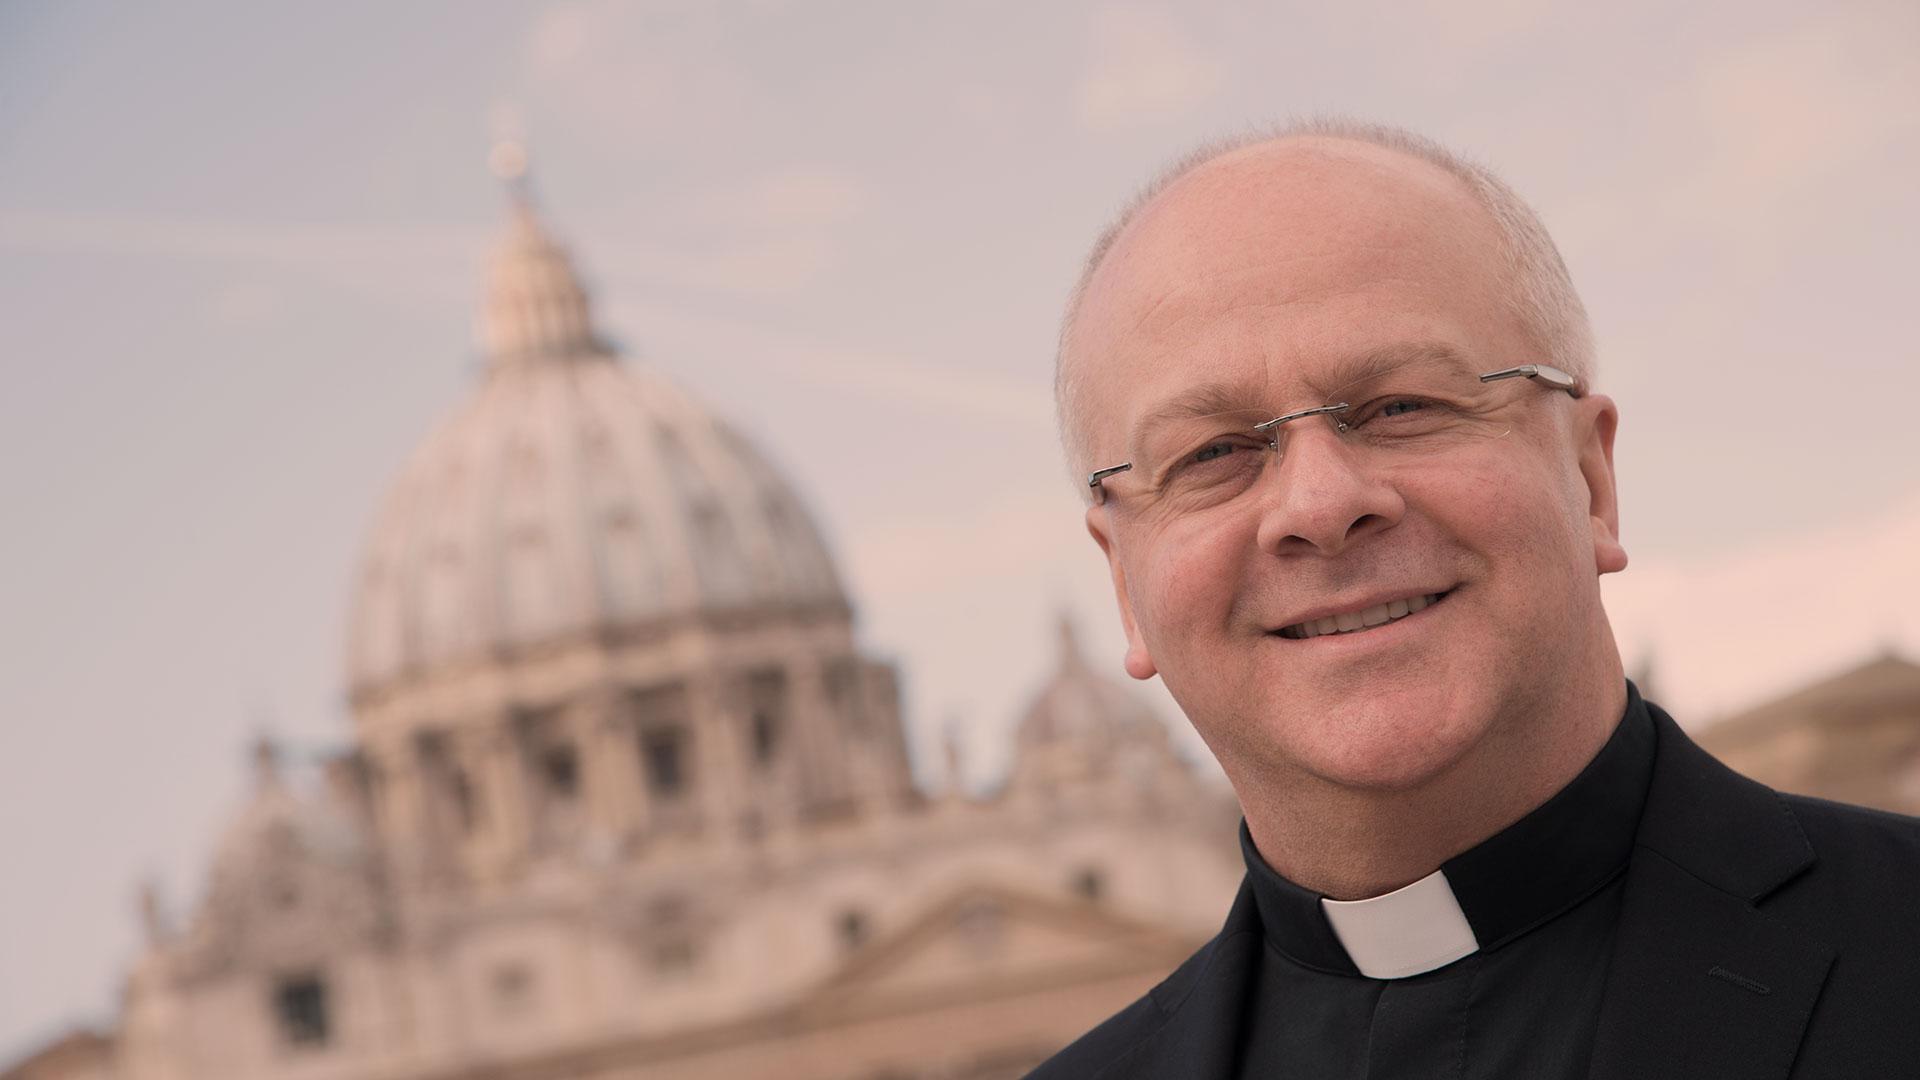 Fr. Alan photo